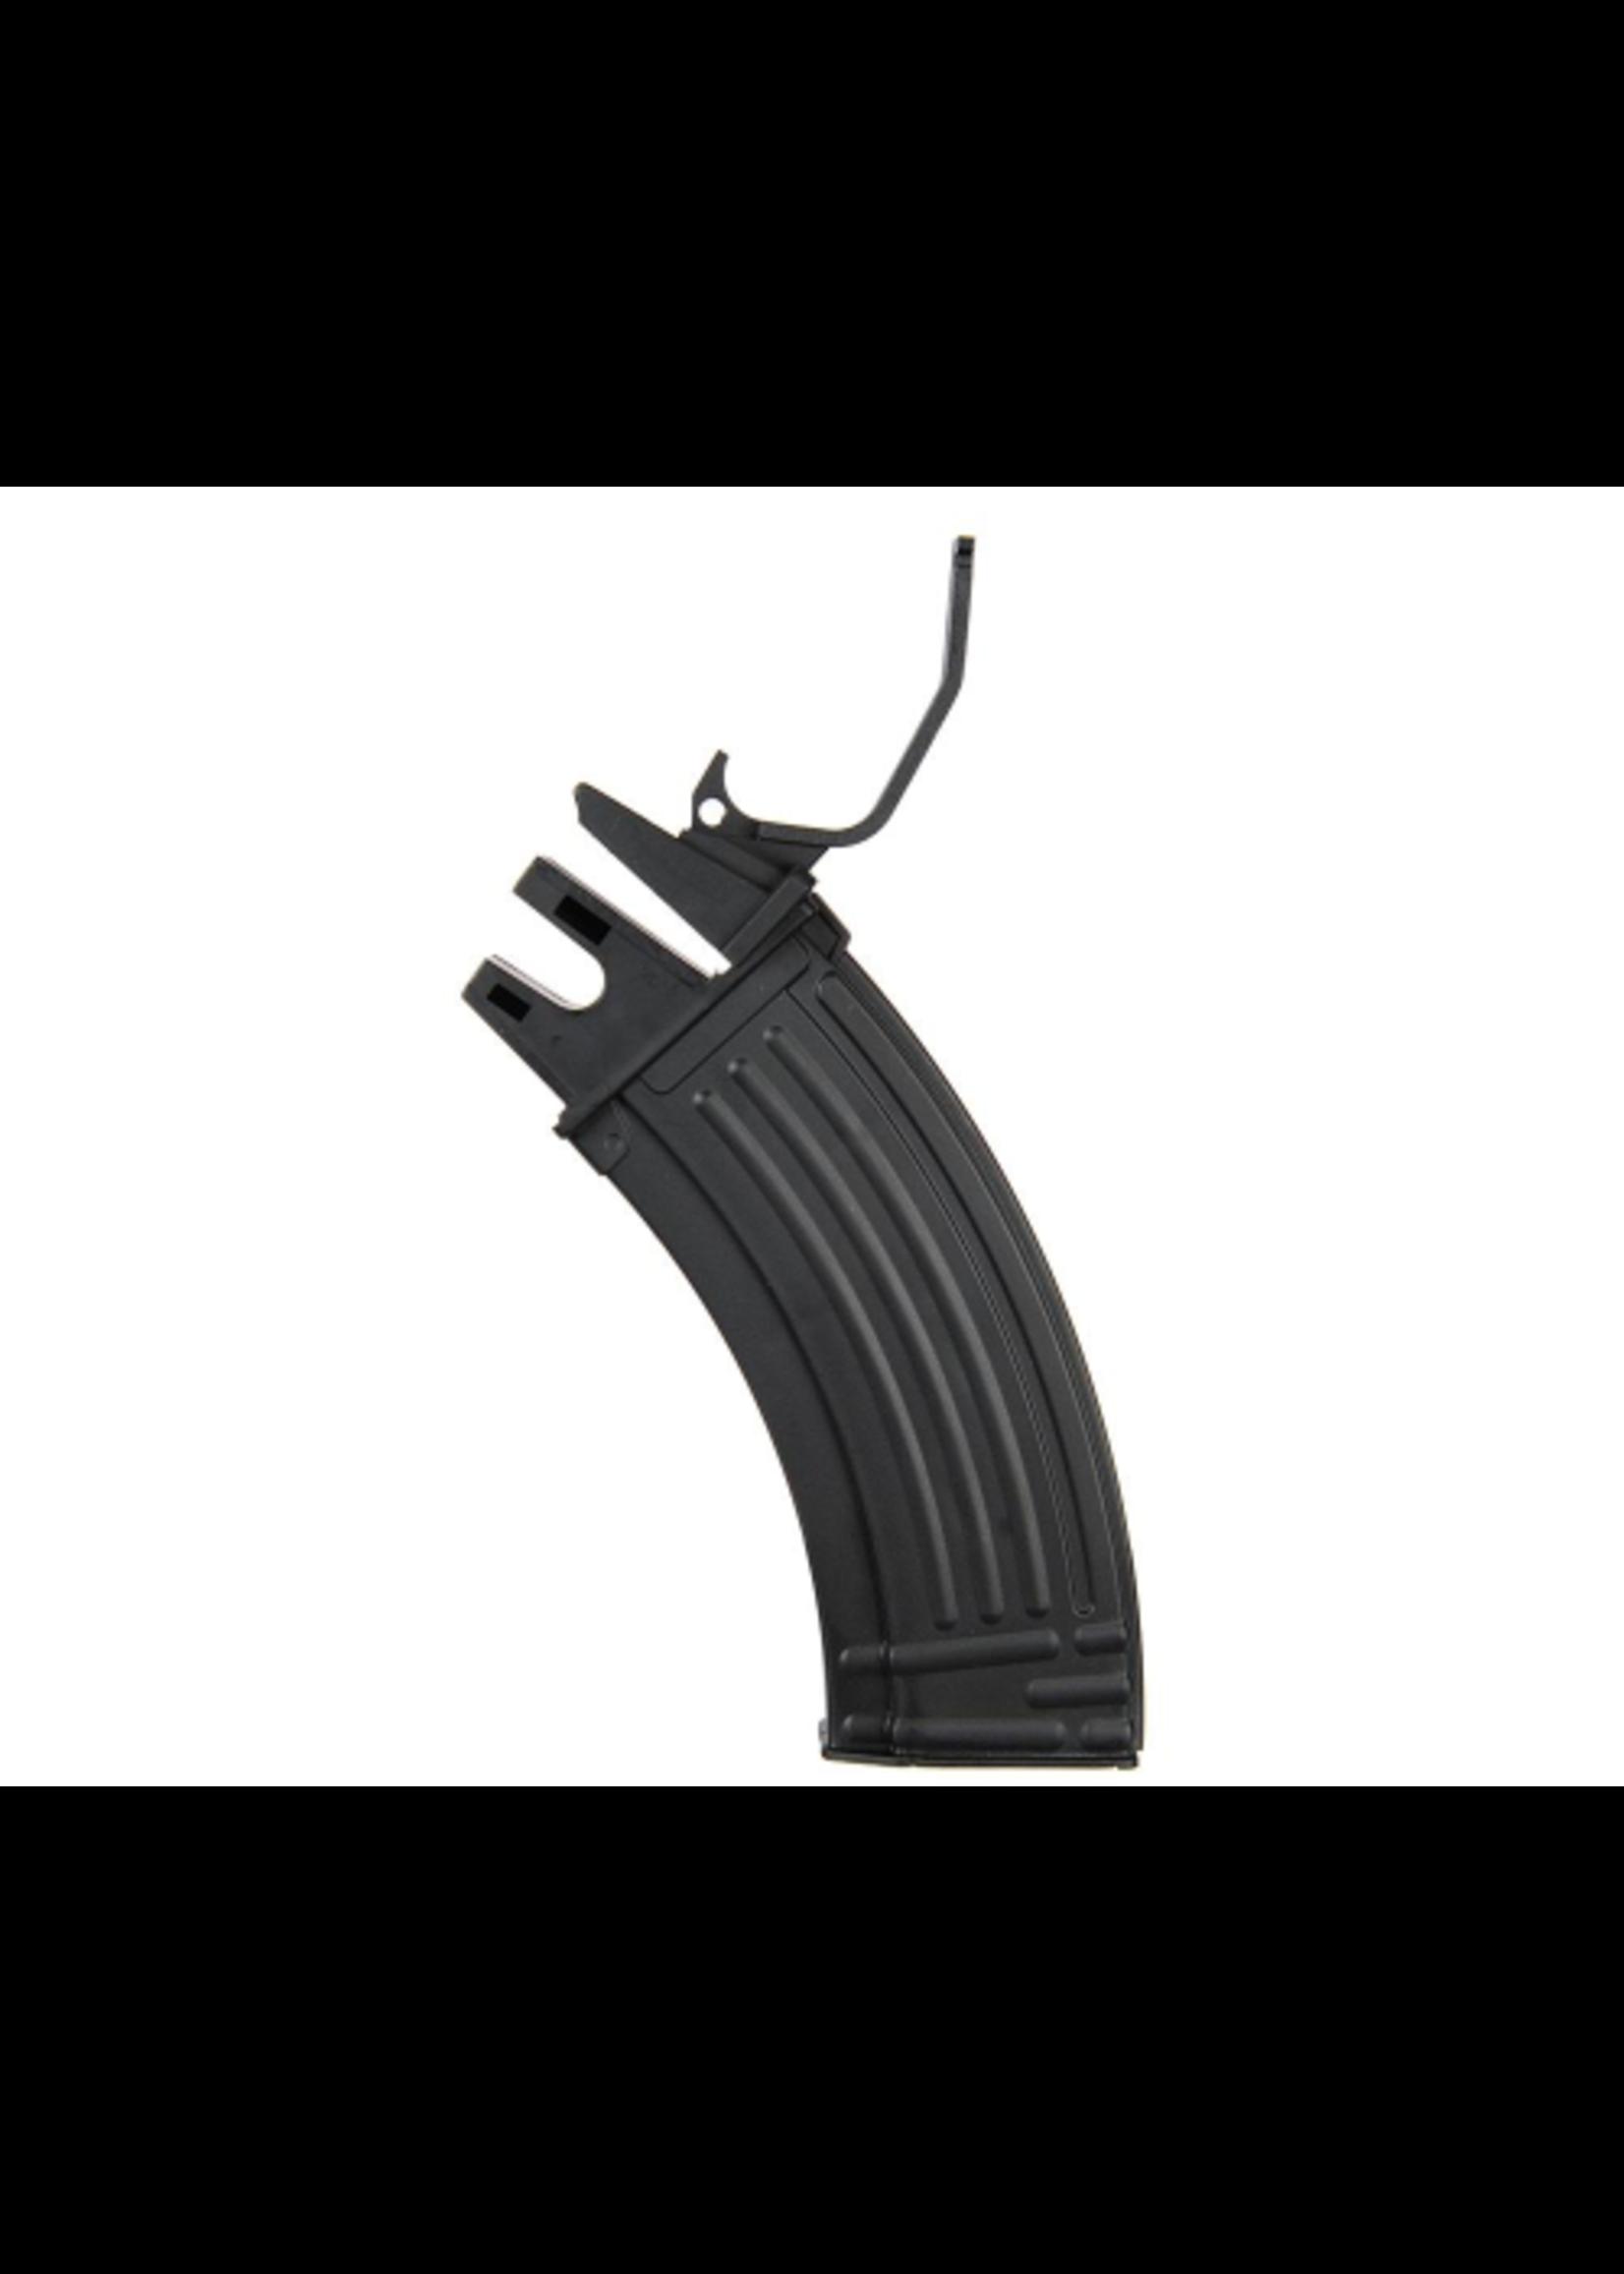 TIPPMANN TIPPMANN X7PHENOM AK-47 MAG